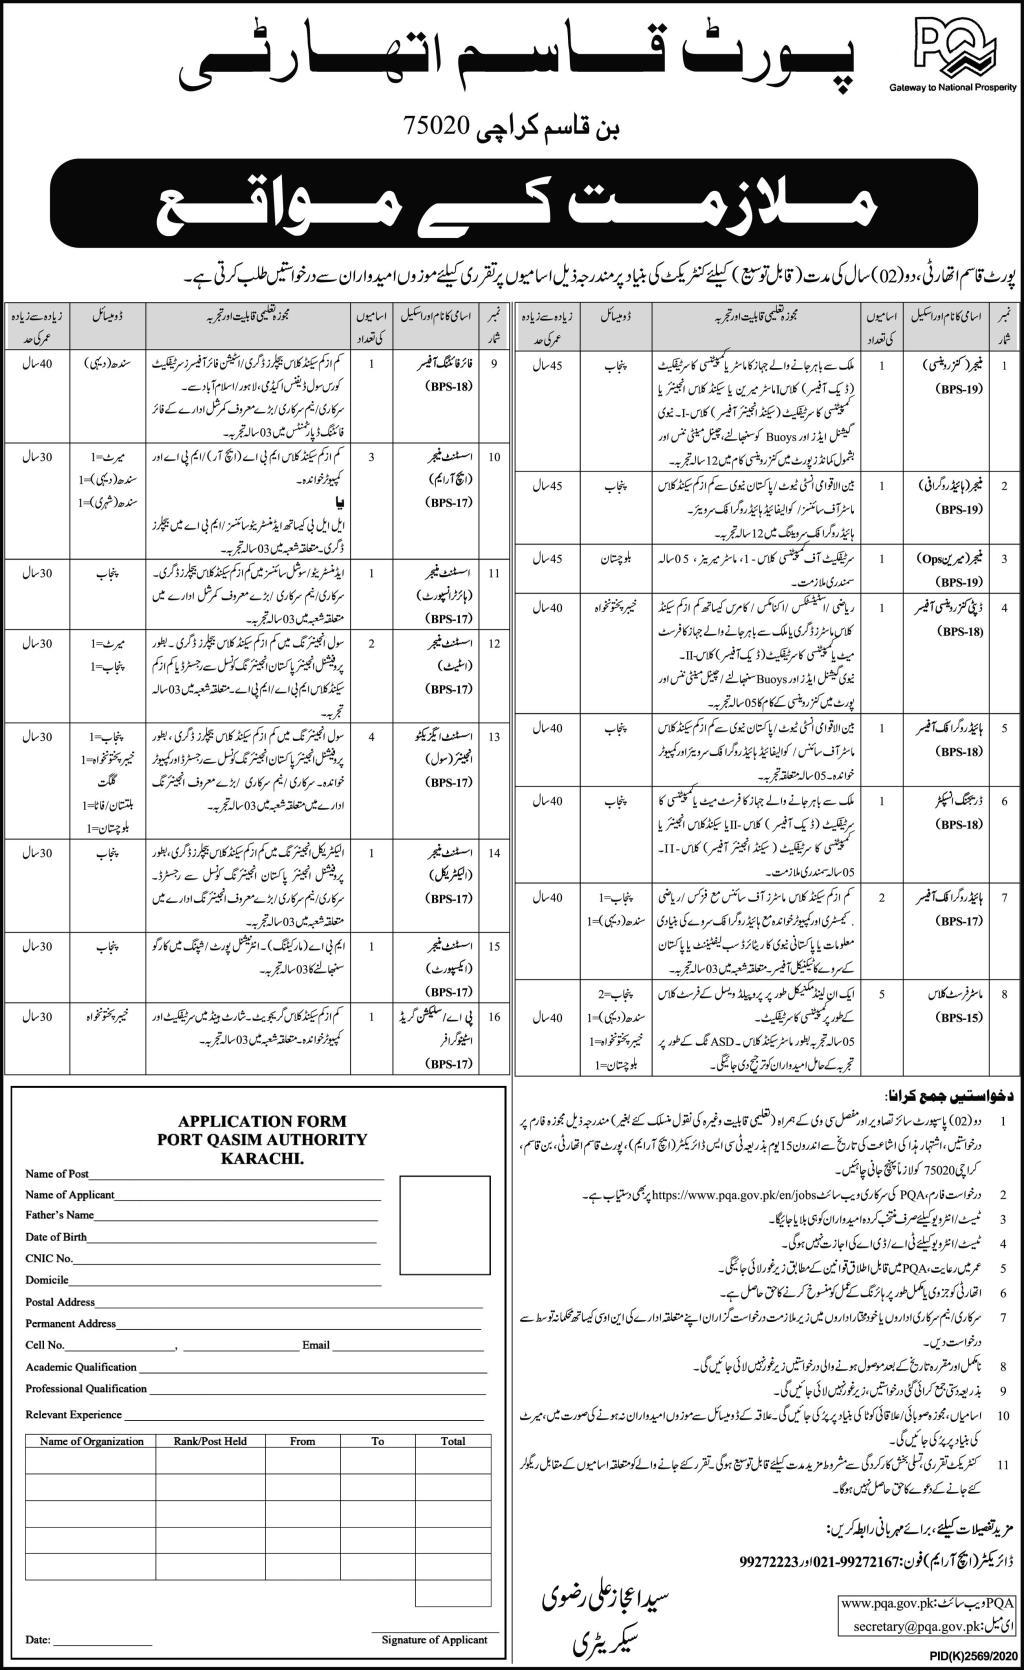 Port Qasim Authority Jobs 2021 in Karachi